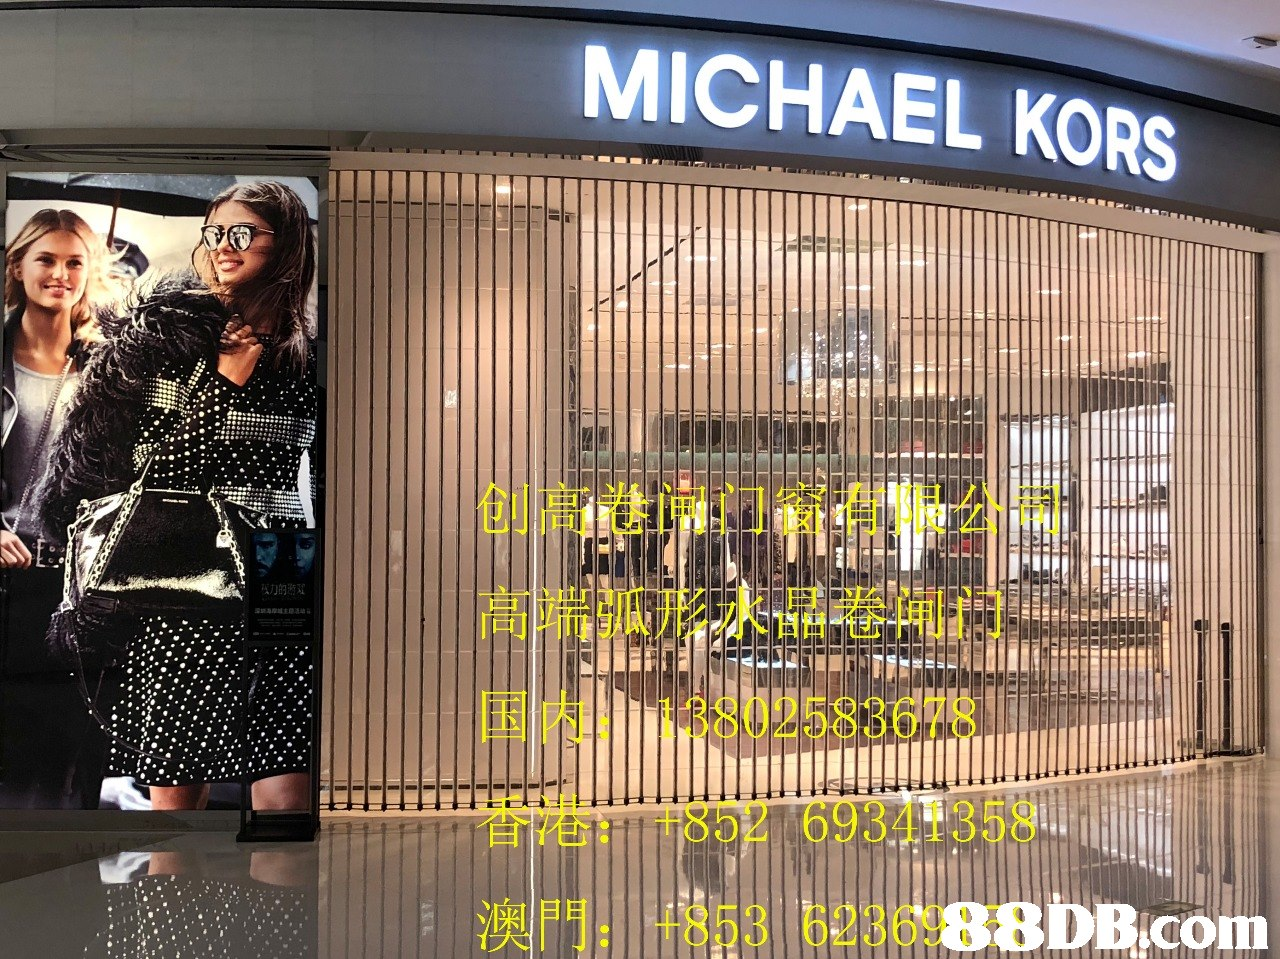 MICHAEL KORS 创高卷闸门窗有限公司 高端弧形水晶卷闸门 国内: 13802583678 香港: +852 6934 1358 澳門: +853 623691 么刀的游双 880icom  display window